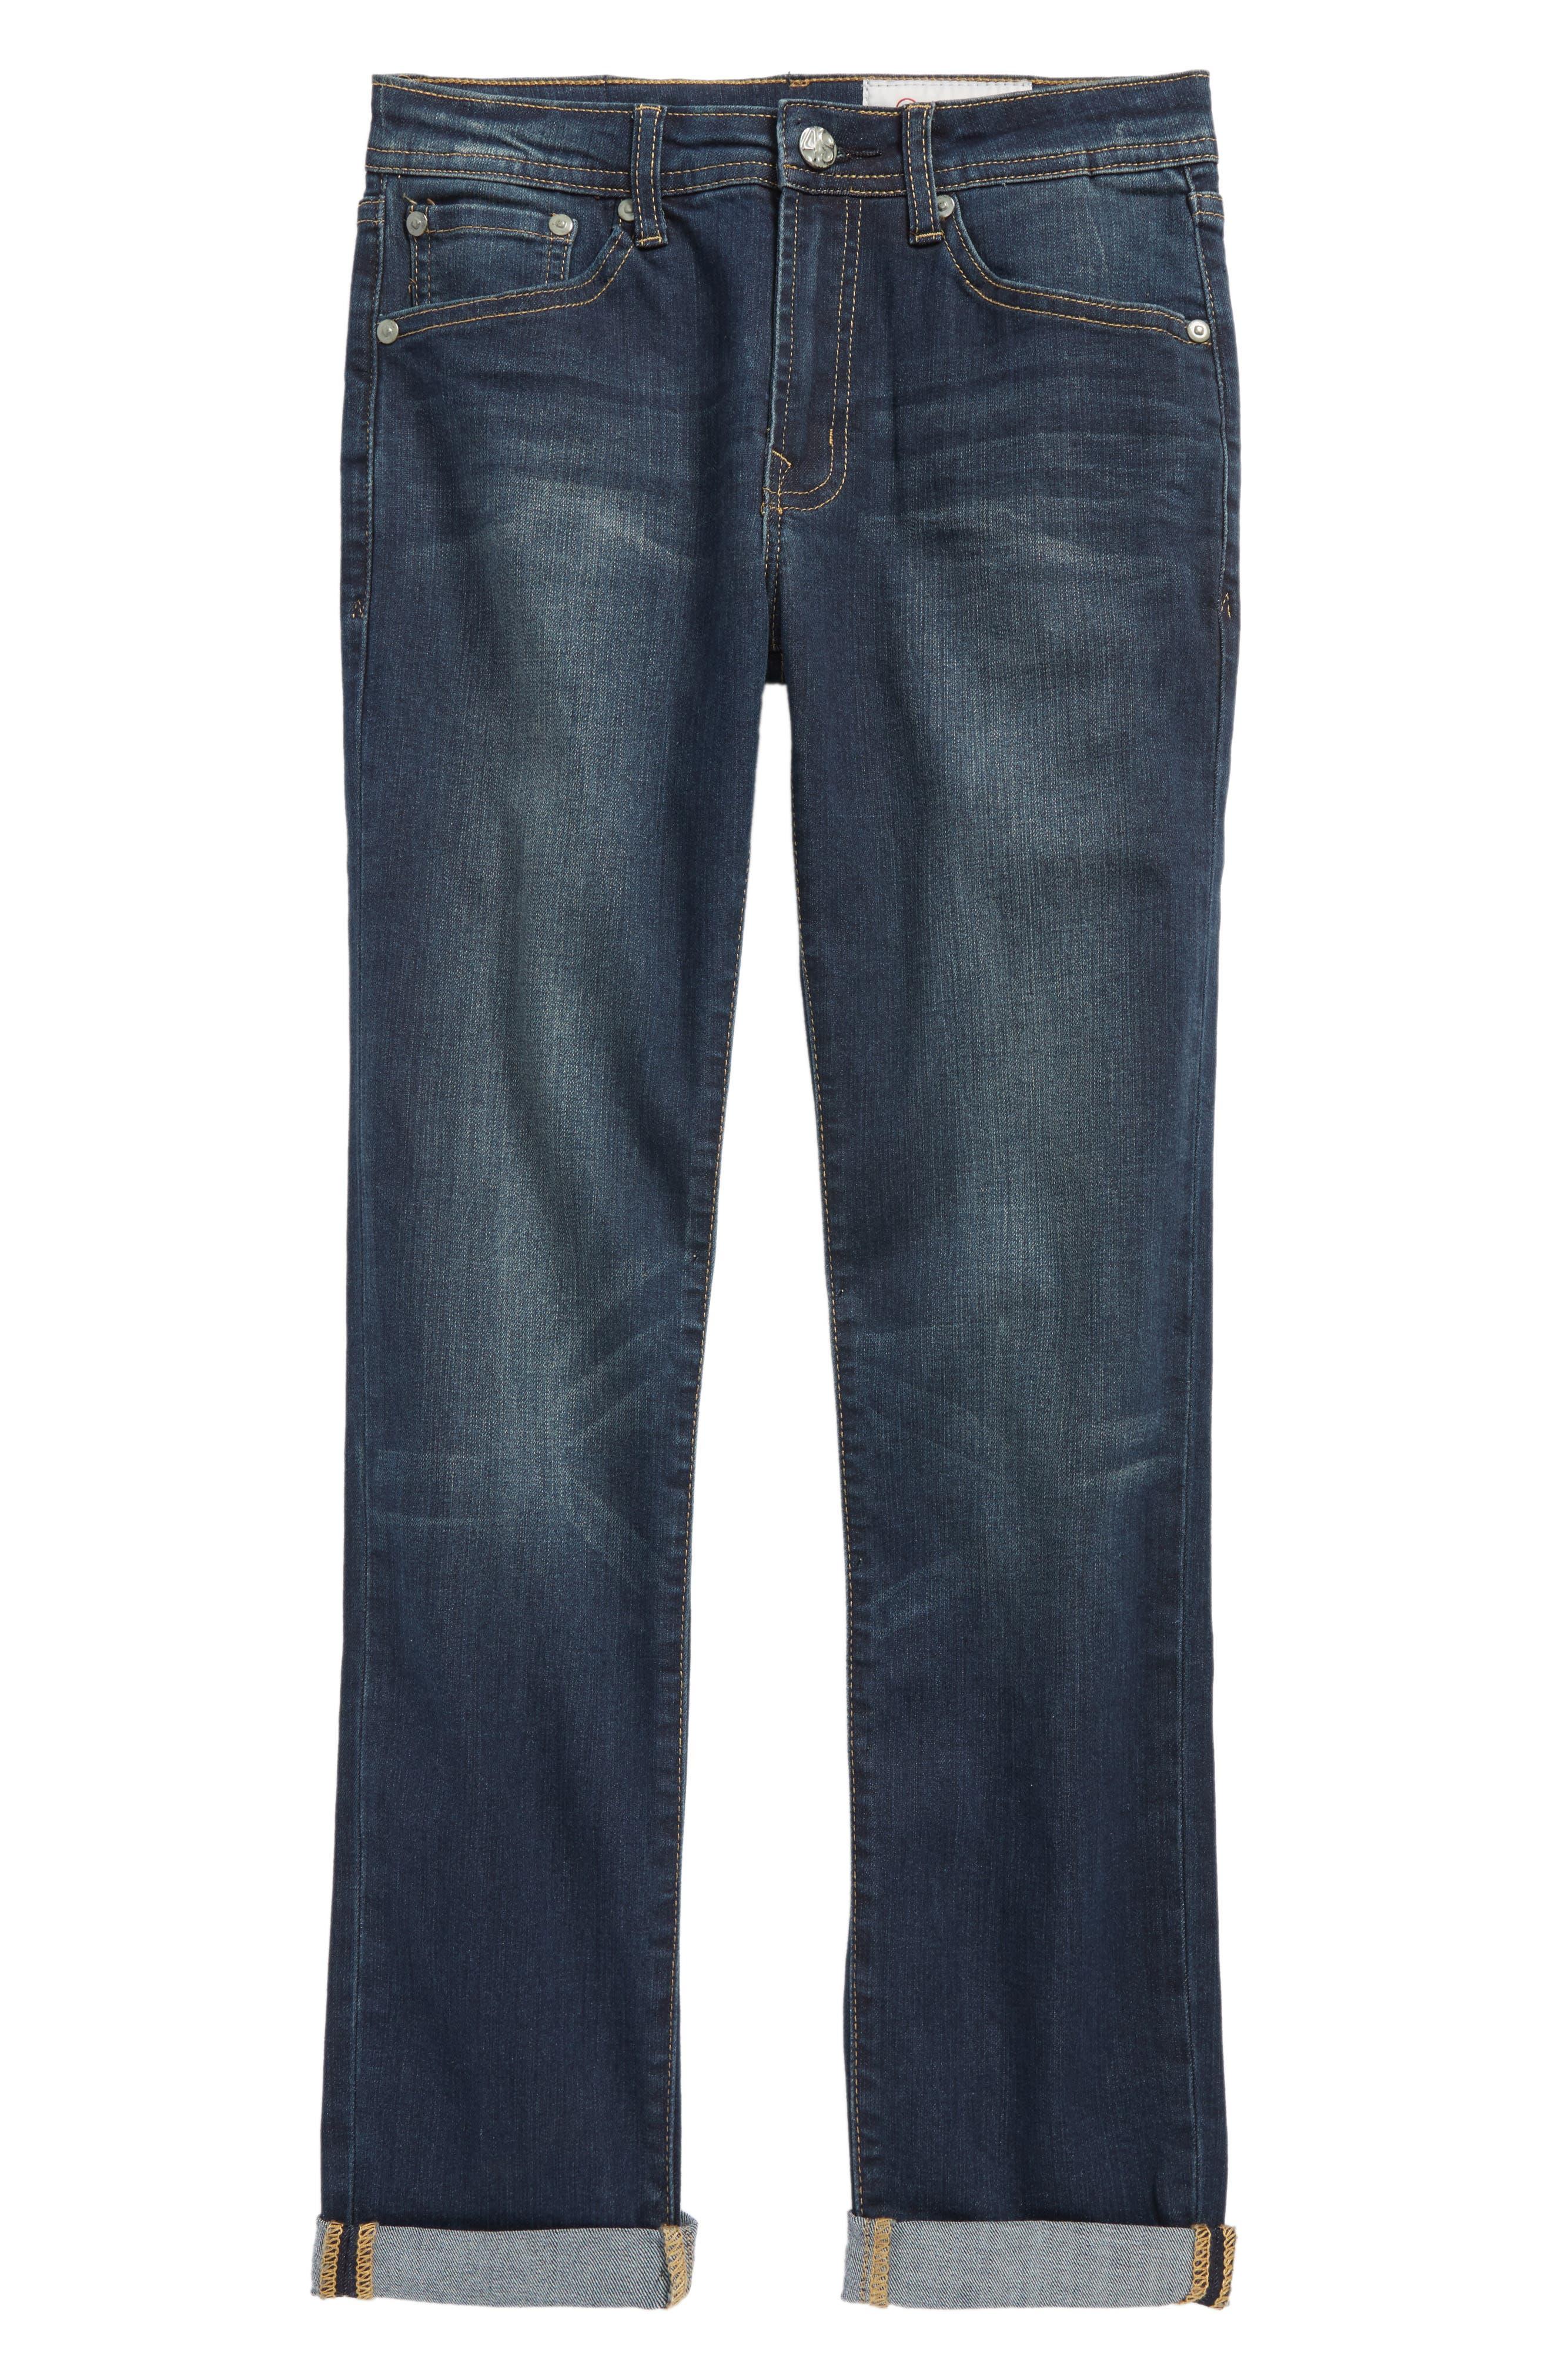 Main Image - AG The James Slim Straight Leg Jeans (Big Boys)